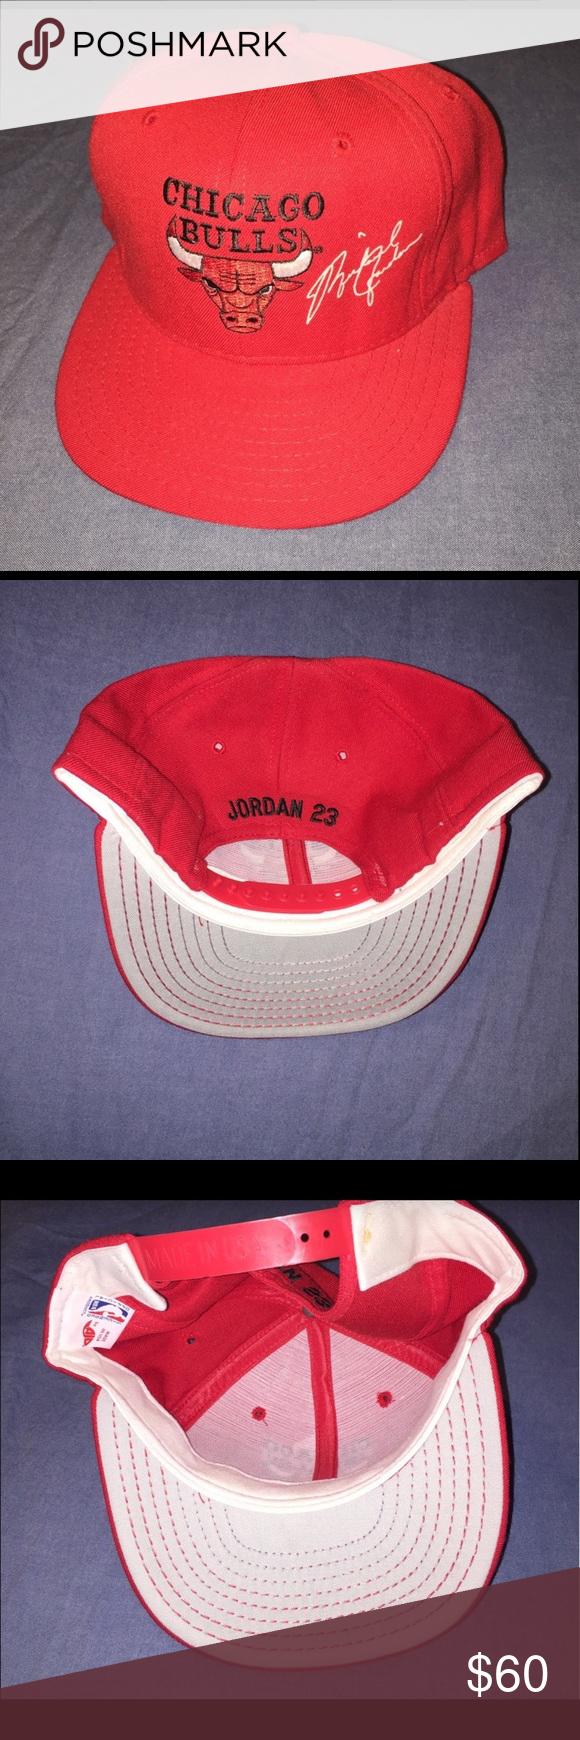 4395a42144ac7f Vintage Michael Jordan Snapback Hat w  Nameplate Vintage AJD Chicago Bulls  Michael Jordan Autographed Snapback Hat. Hat features Jordan Nameplate  above hat ...